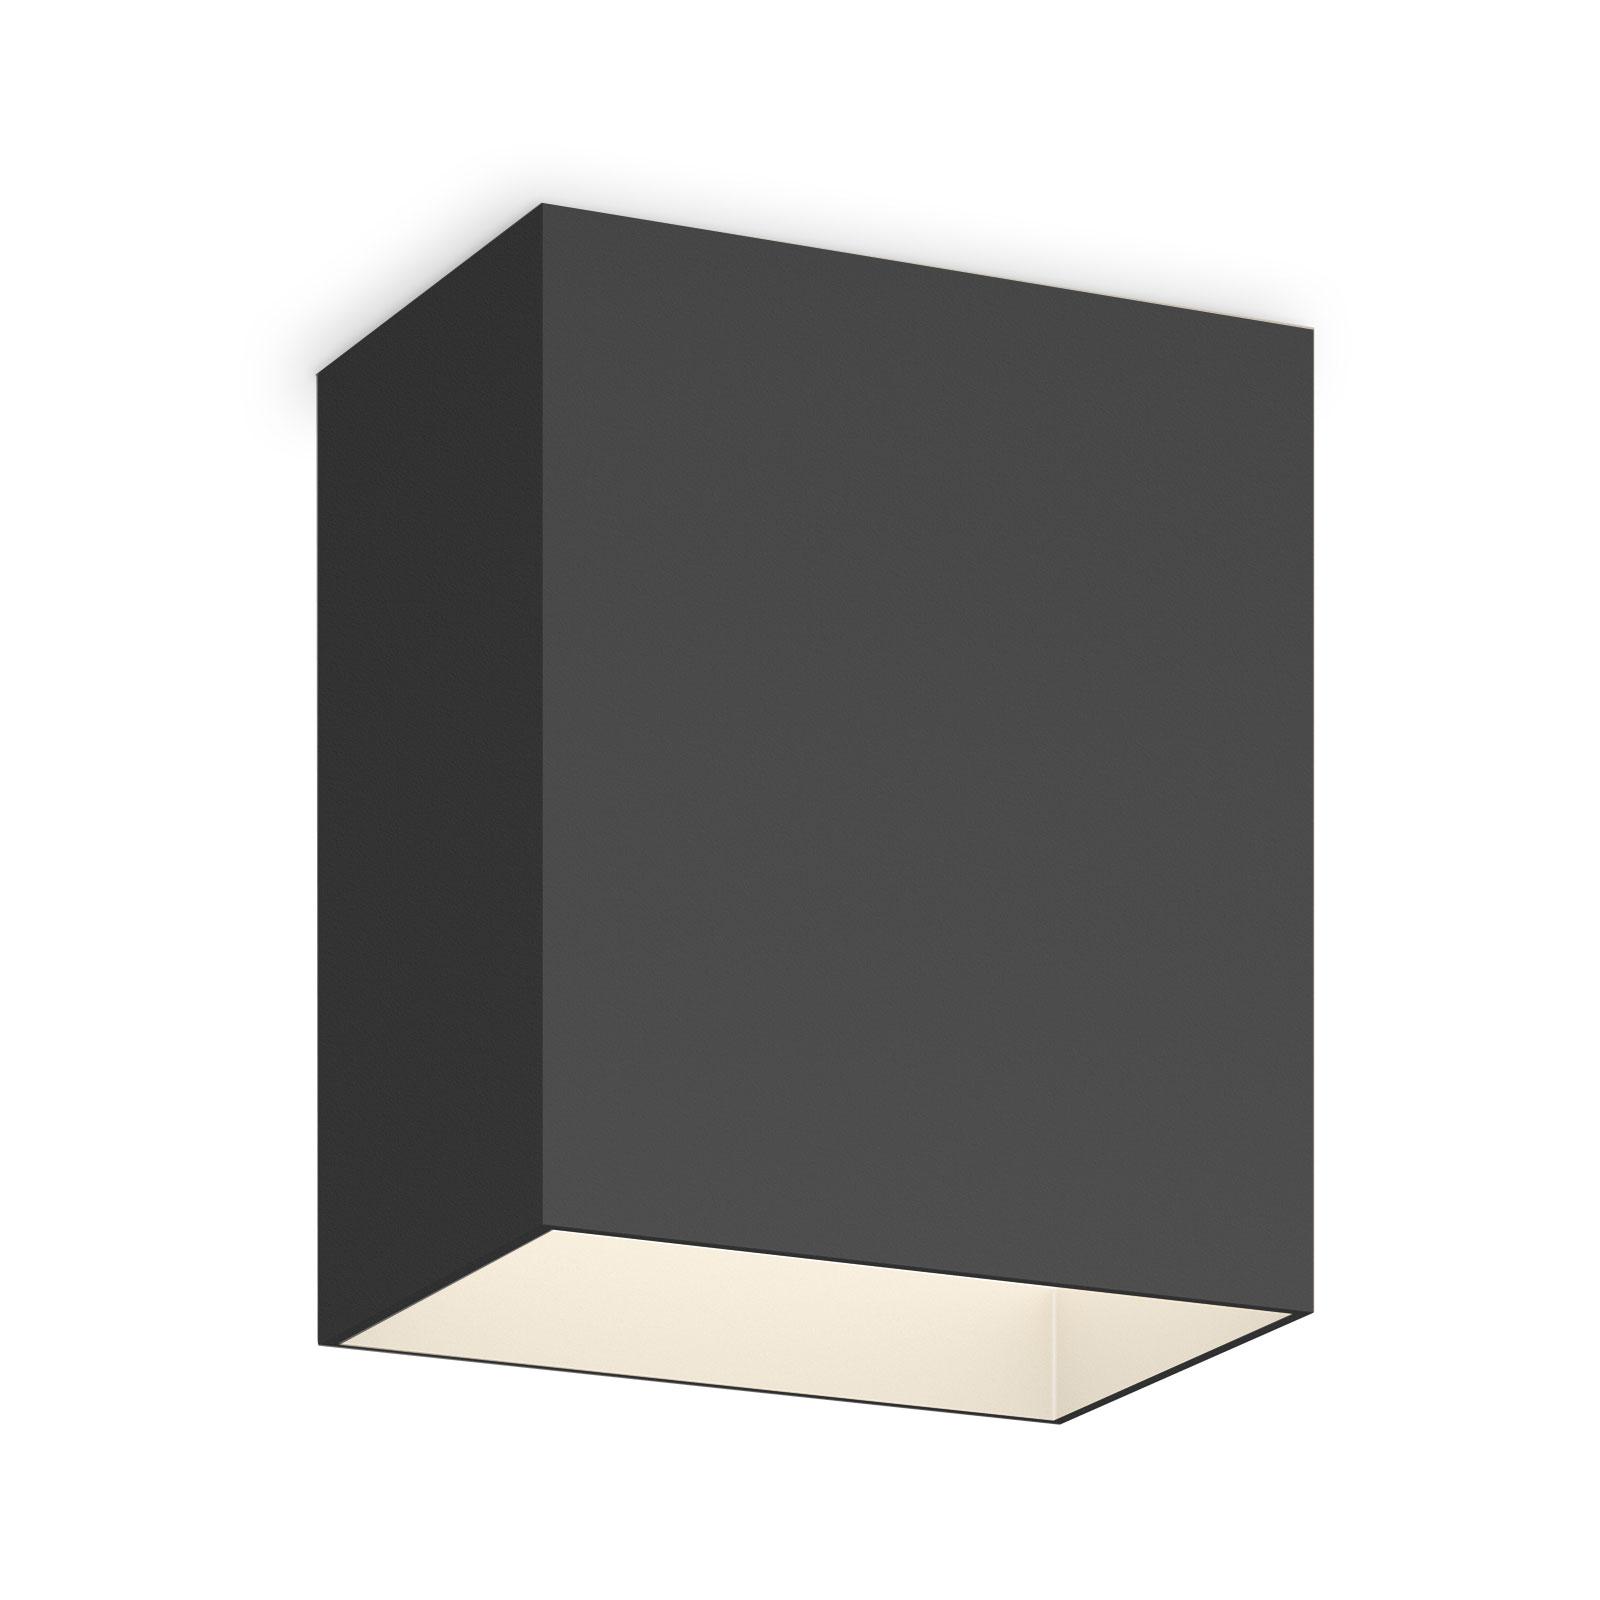 Vibia Structural 2630 kattovalo 18 cm tummanharmaa